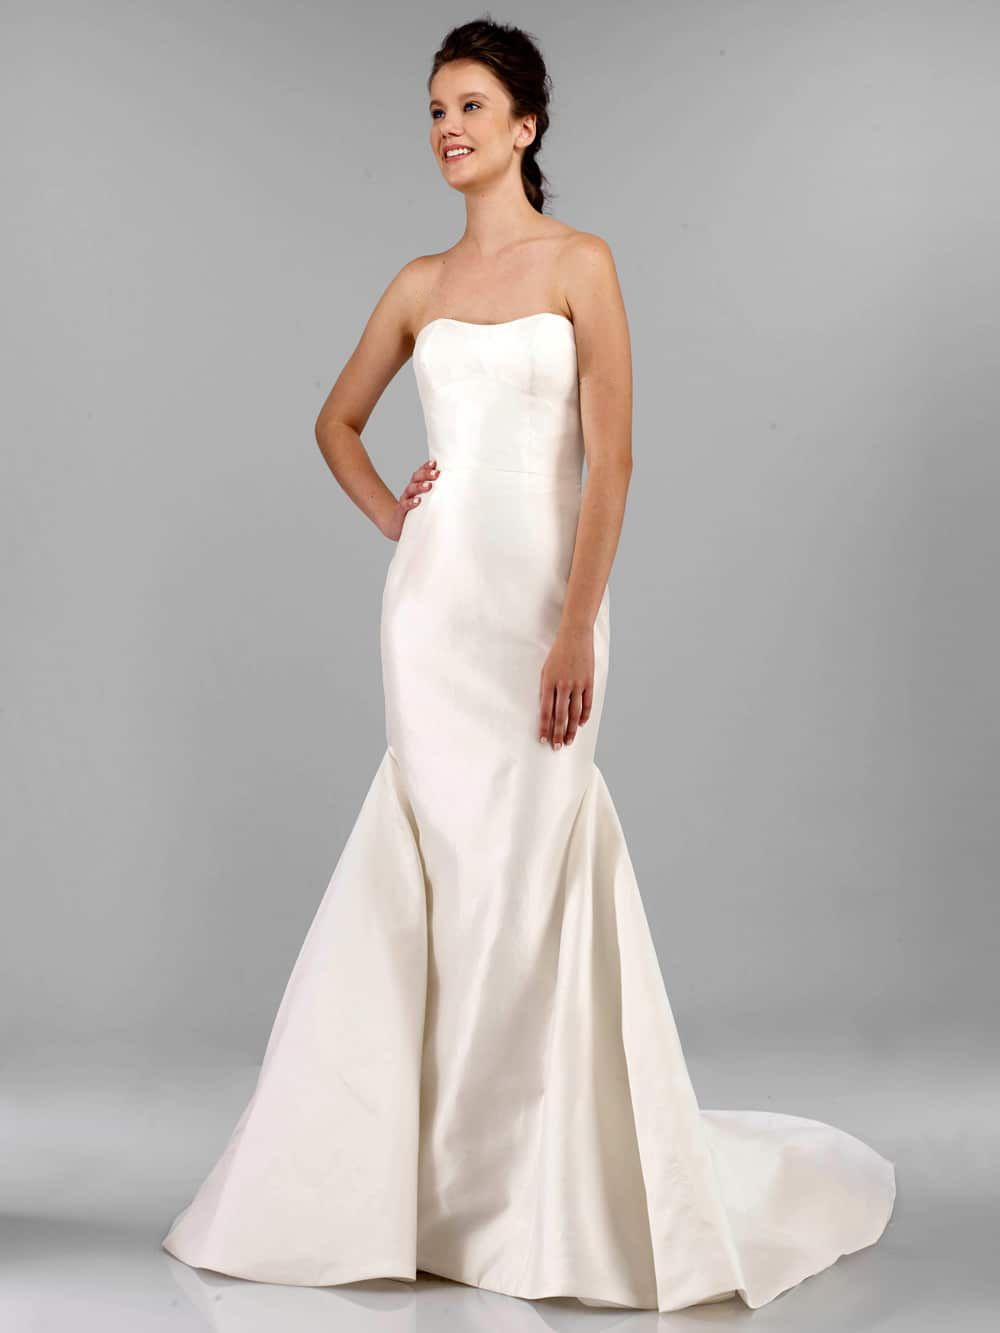 Fashion style Strapless beautiful wedding dresses photo for lady